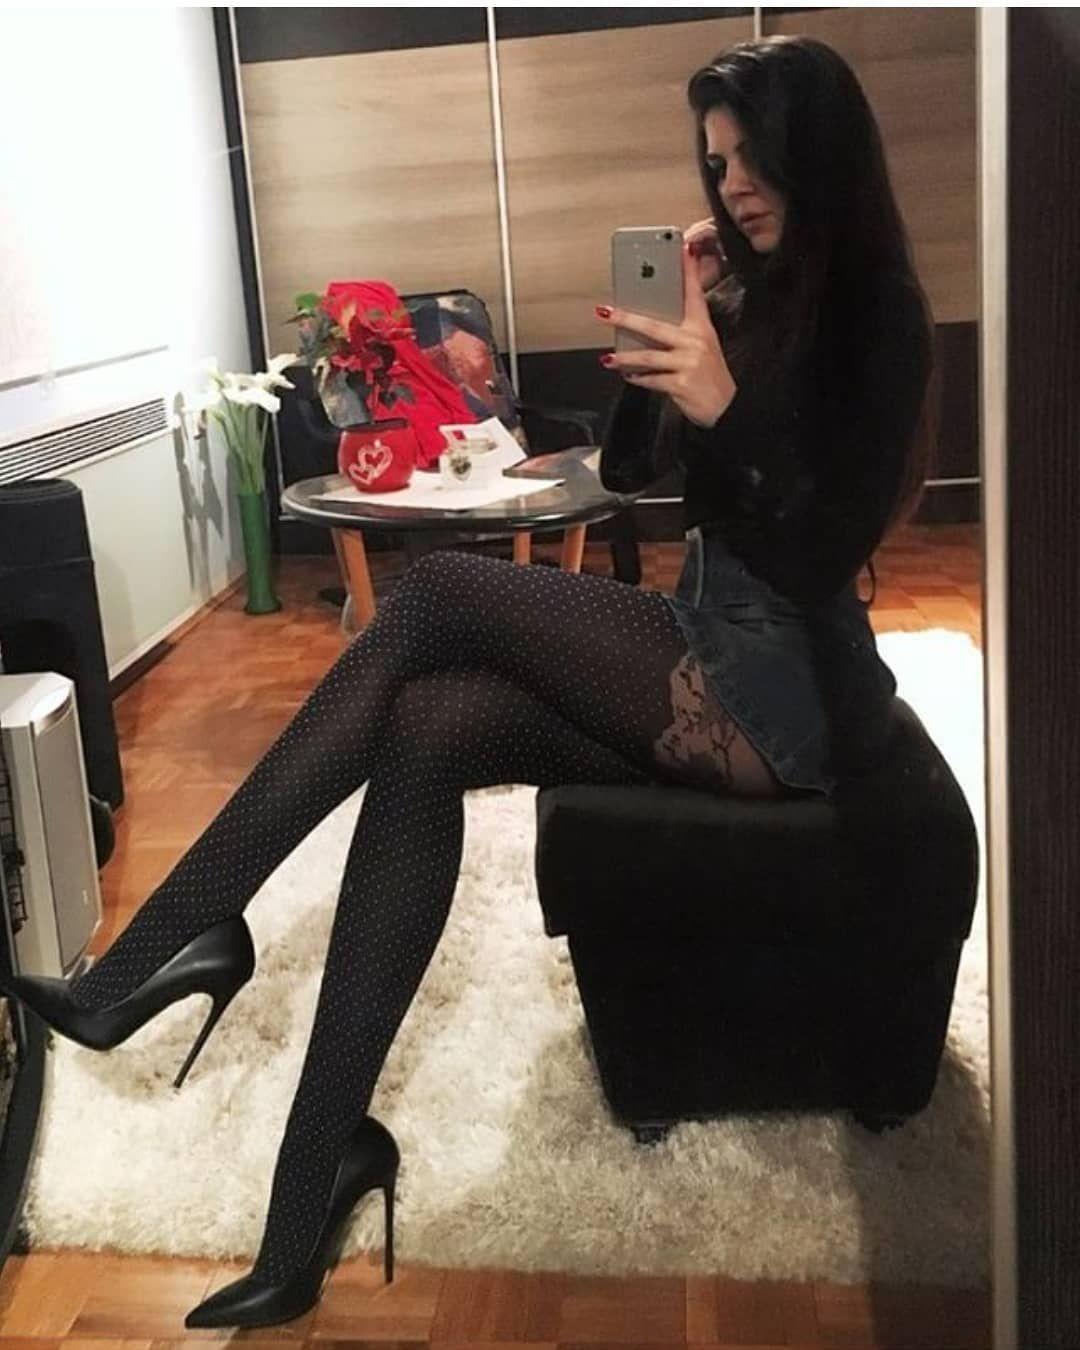 Beauty In Hot Heels @habanerica 🔥 #shoes #shoeporn